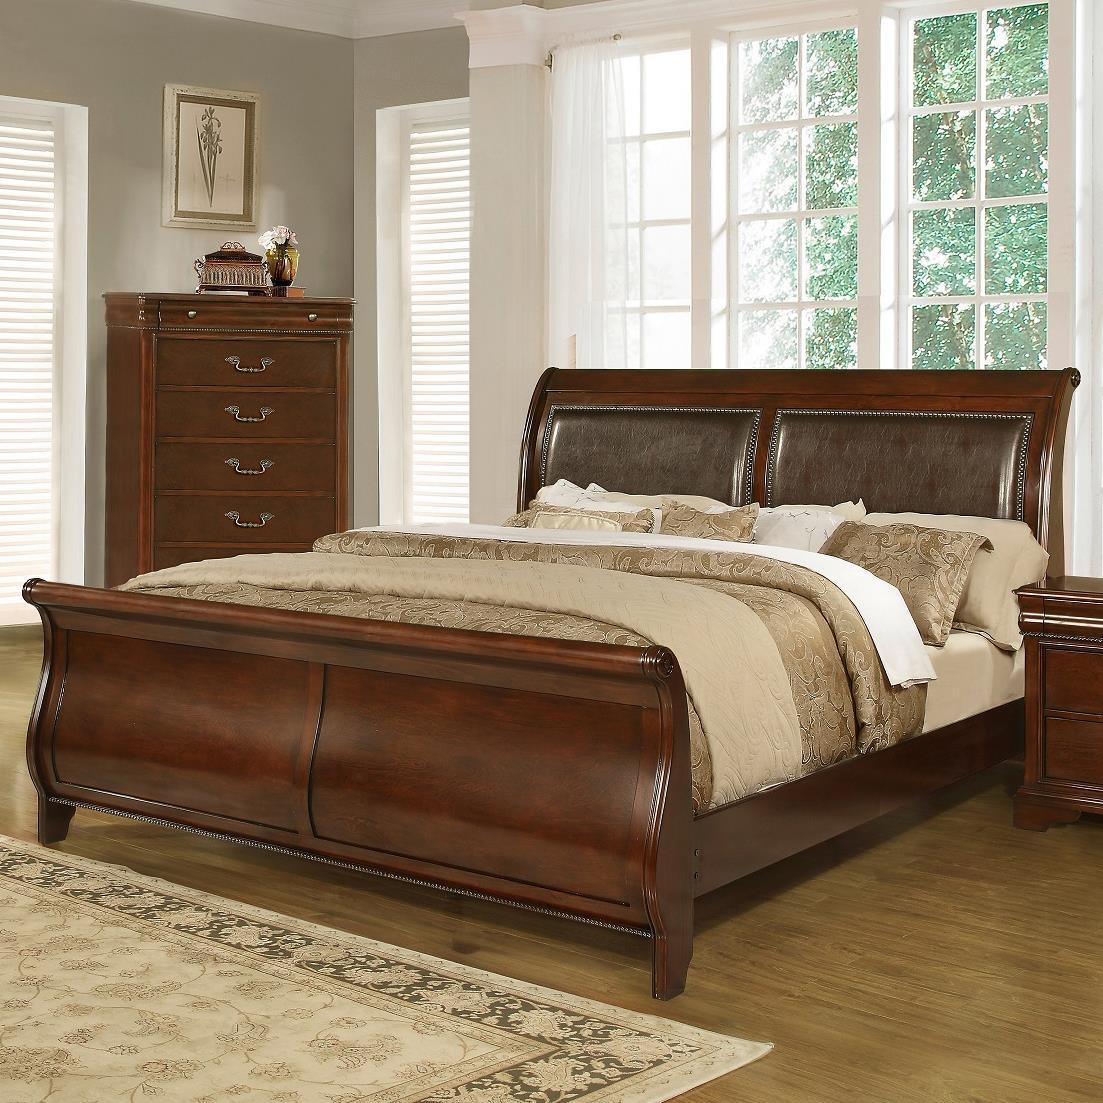 c4116a queen sleigh bed